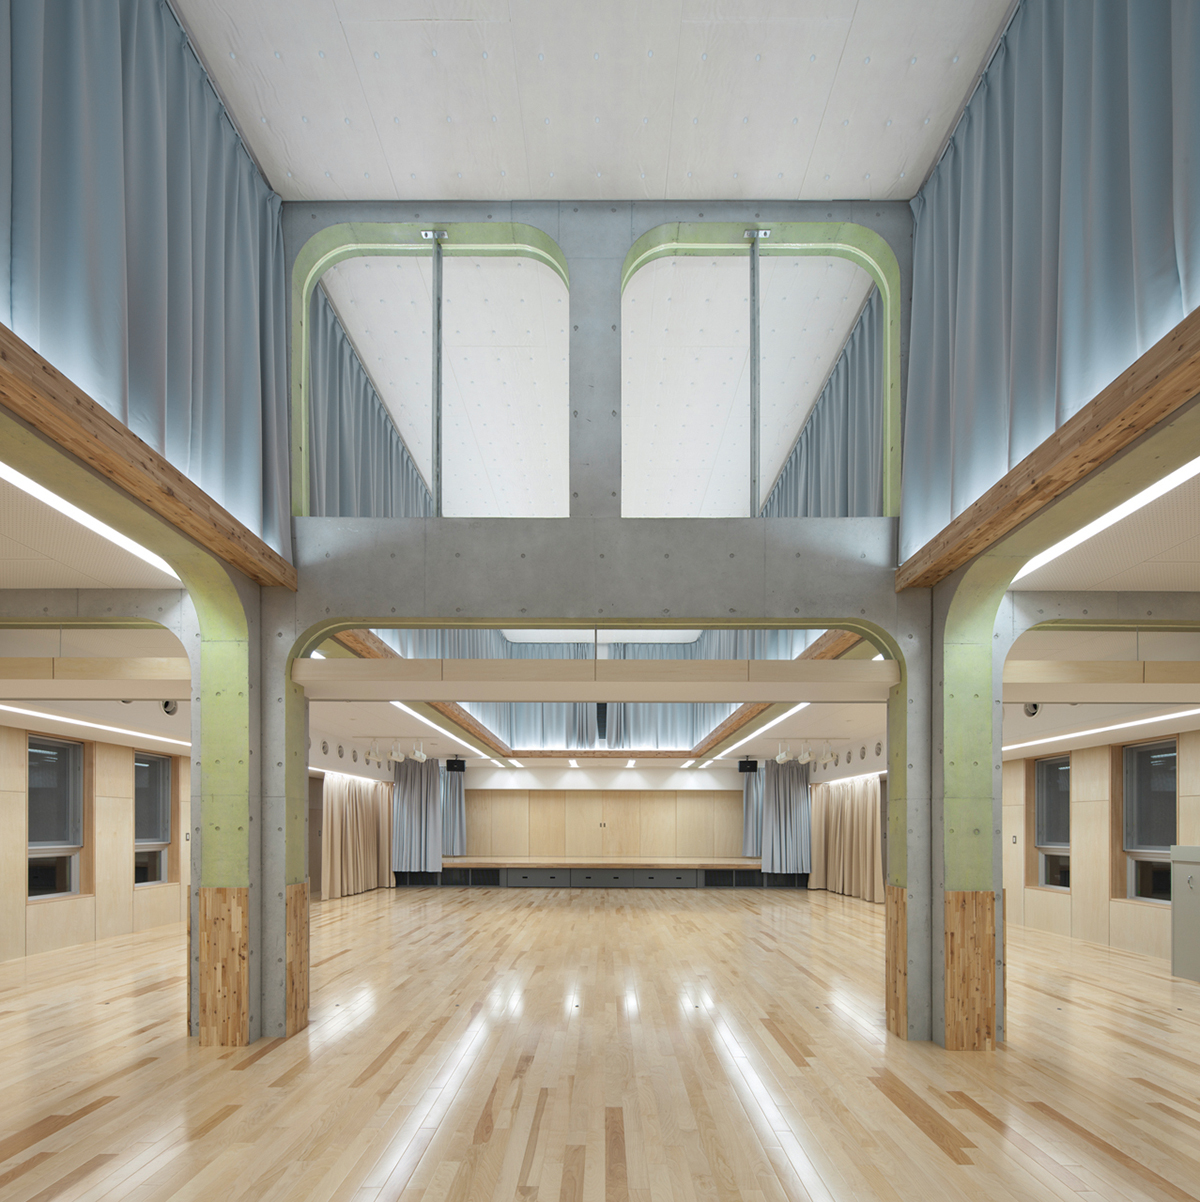 K Kindergarten by NKS Architects in Fukuoka, Japan-